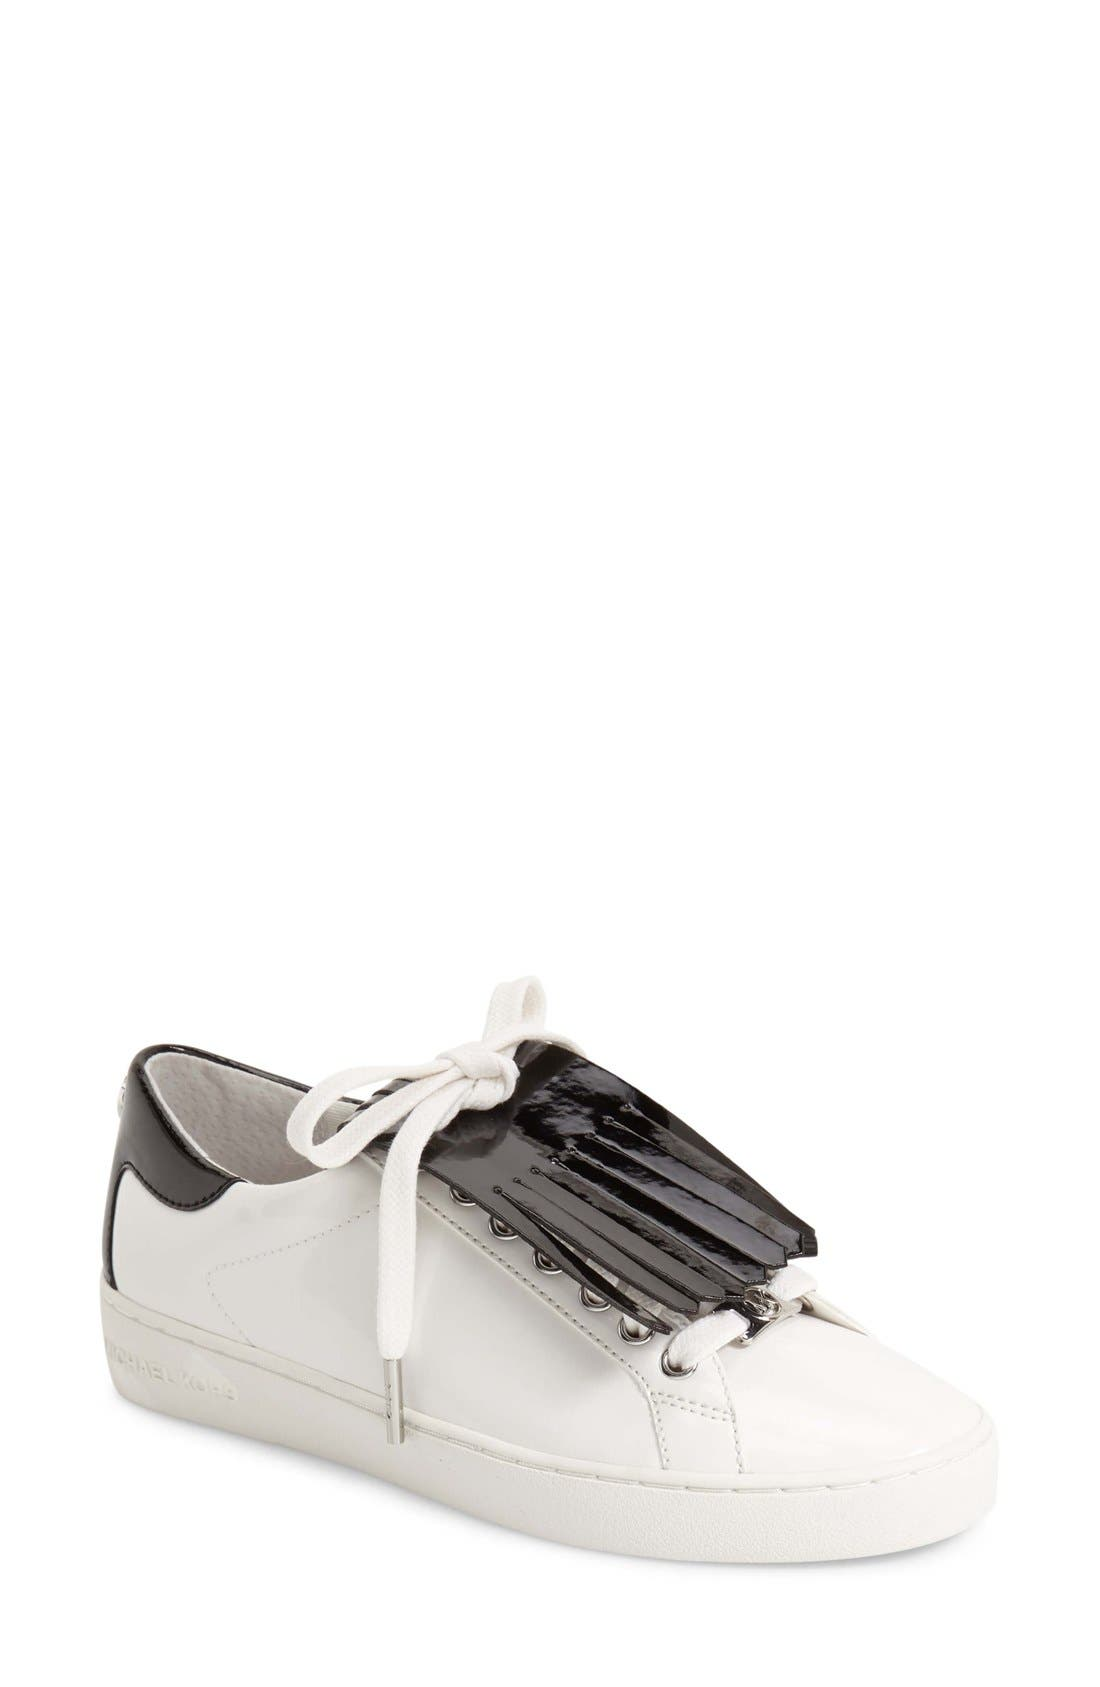 Main Image - MICHAEL Michael Kors'Keaton' KiltieSneaker (Women)